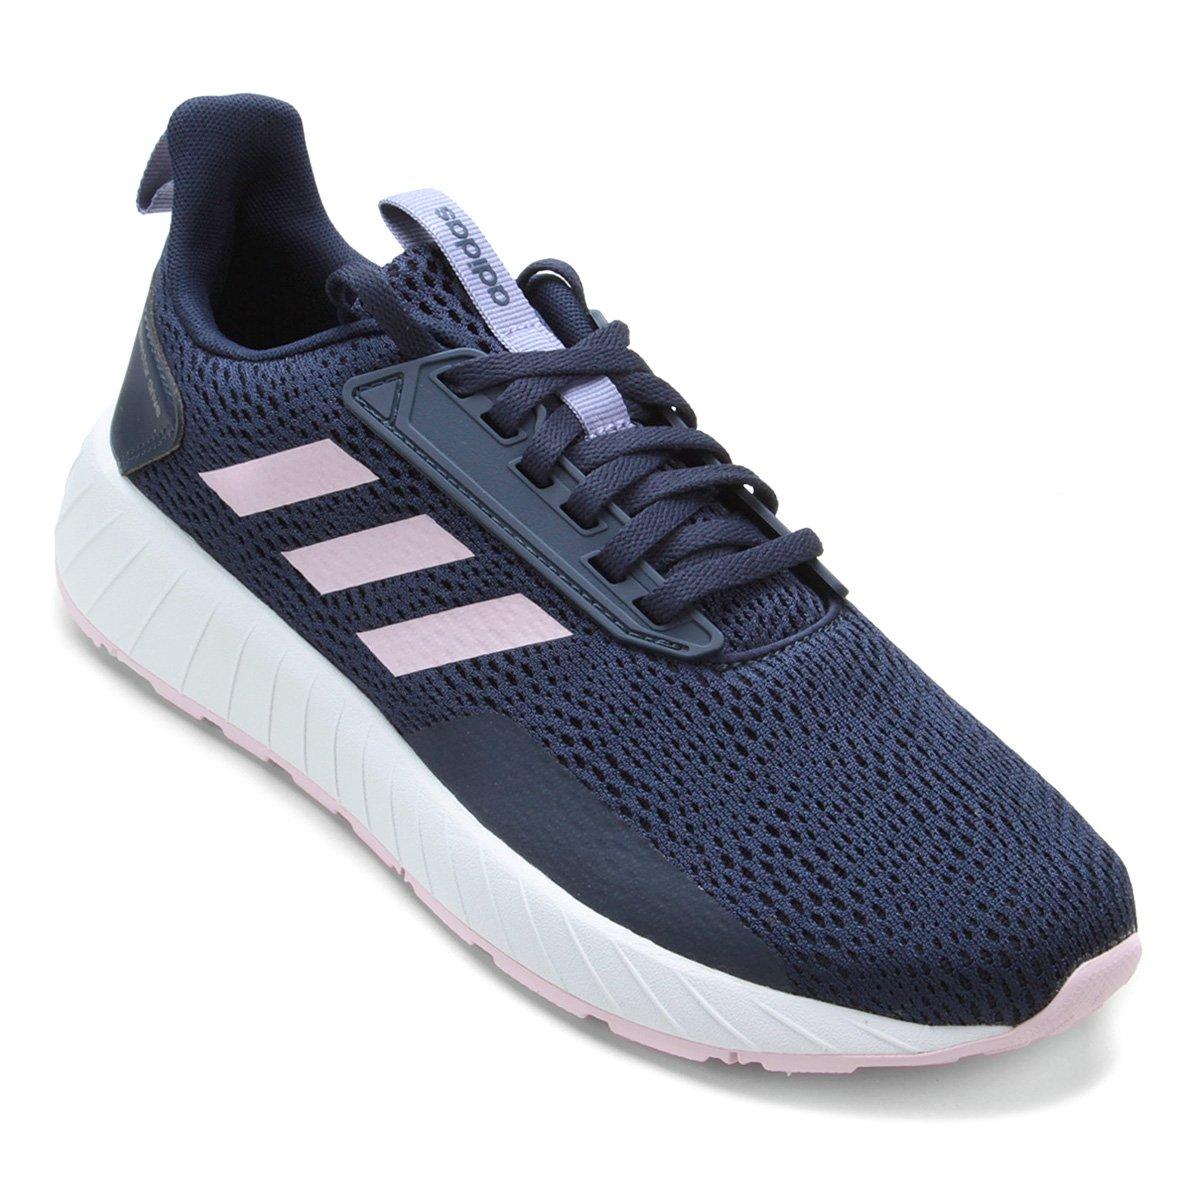 44834a5273 Tênis Adidas Response Drive W Feminina - Marinho   Netshoes